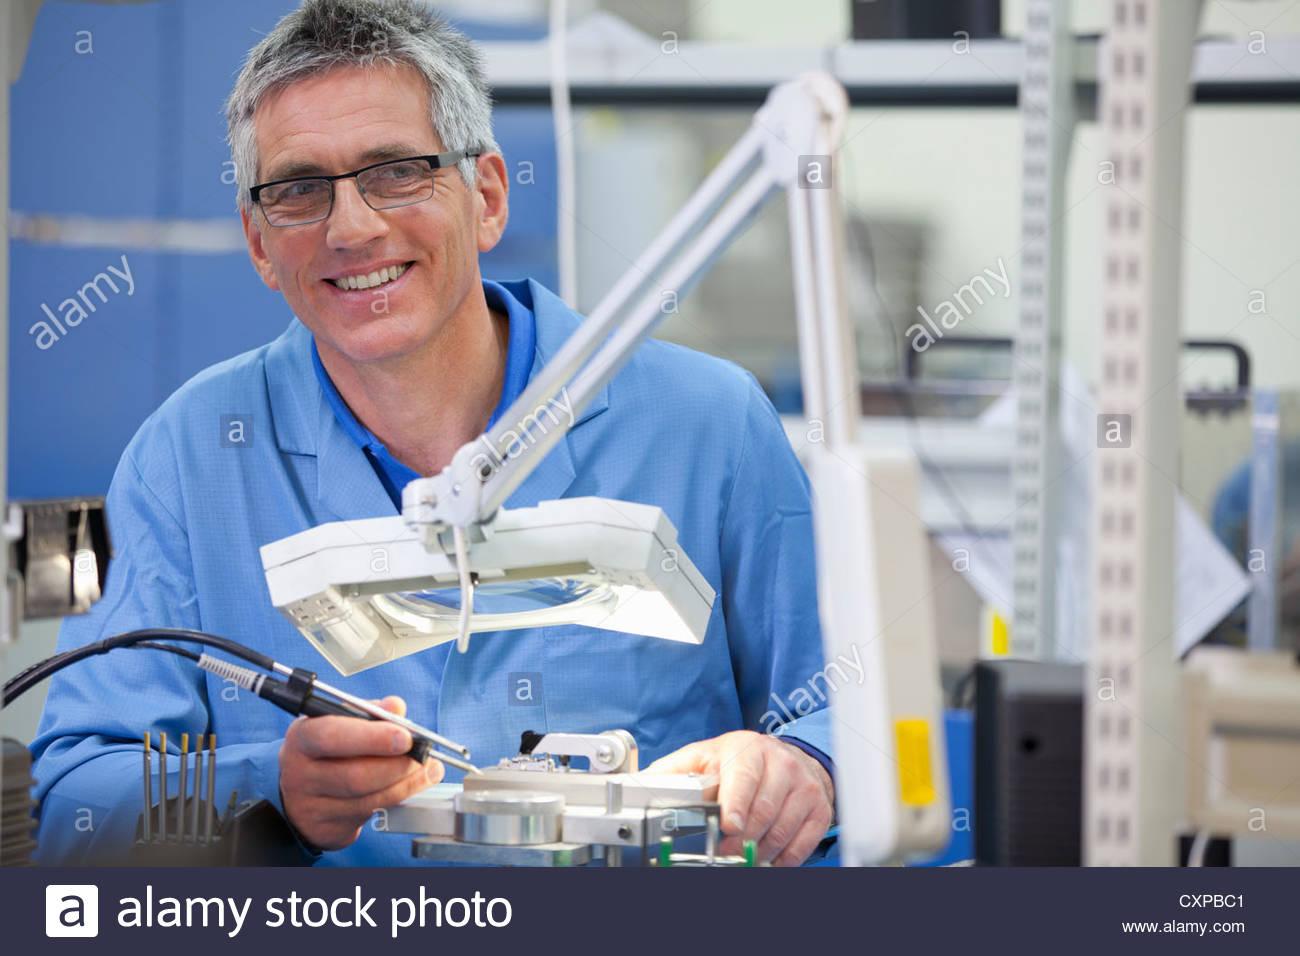 Porträt von lächelnden Techniker arbeiten am Fließband in Hi-Tech-Gerätewerk Stockbild